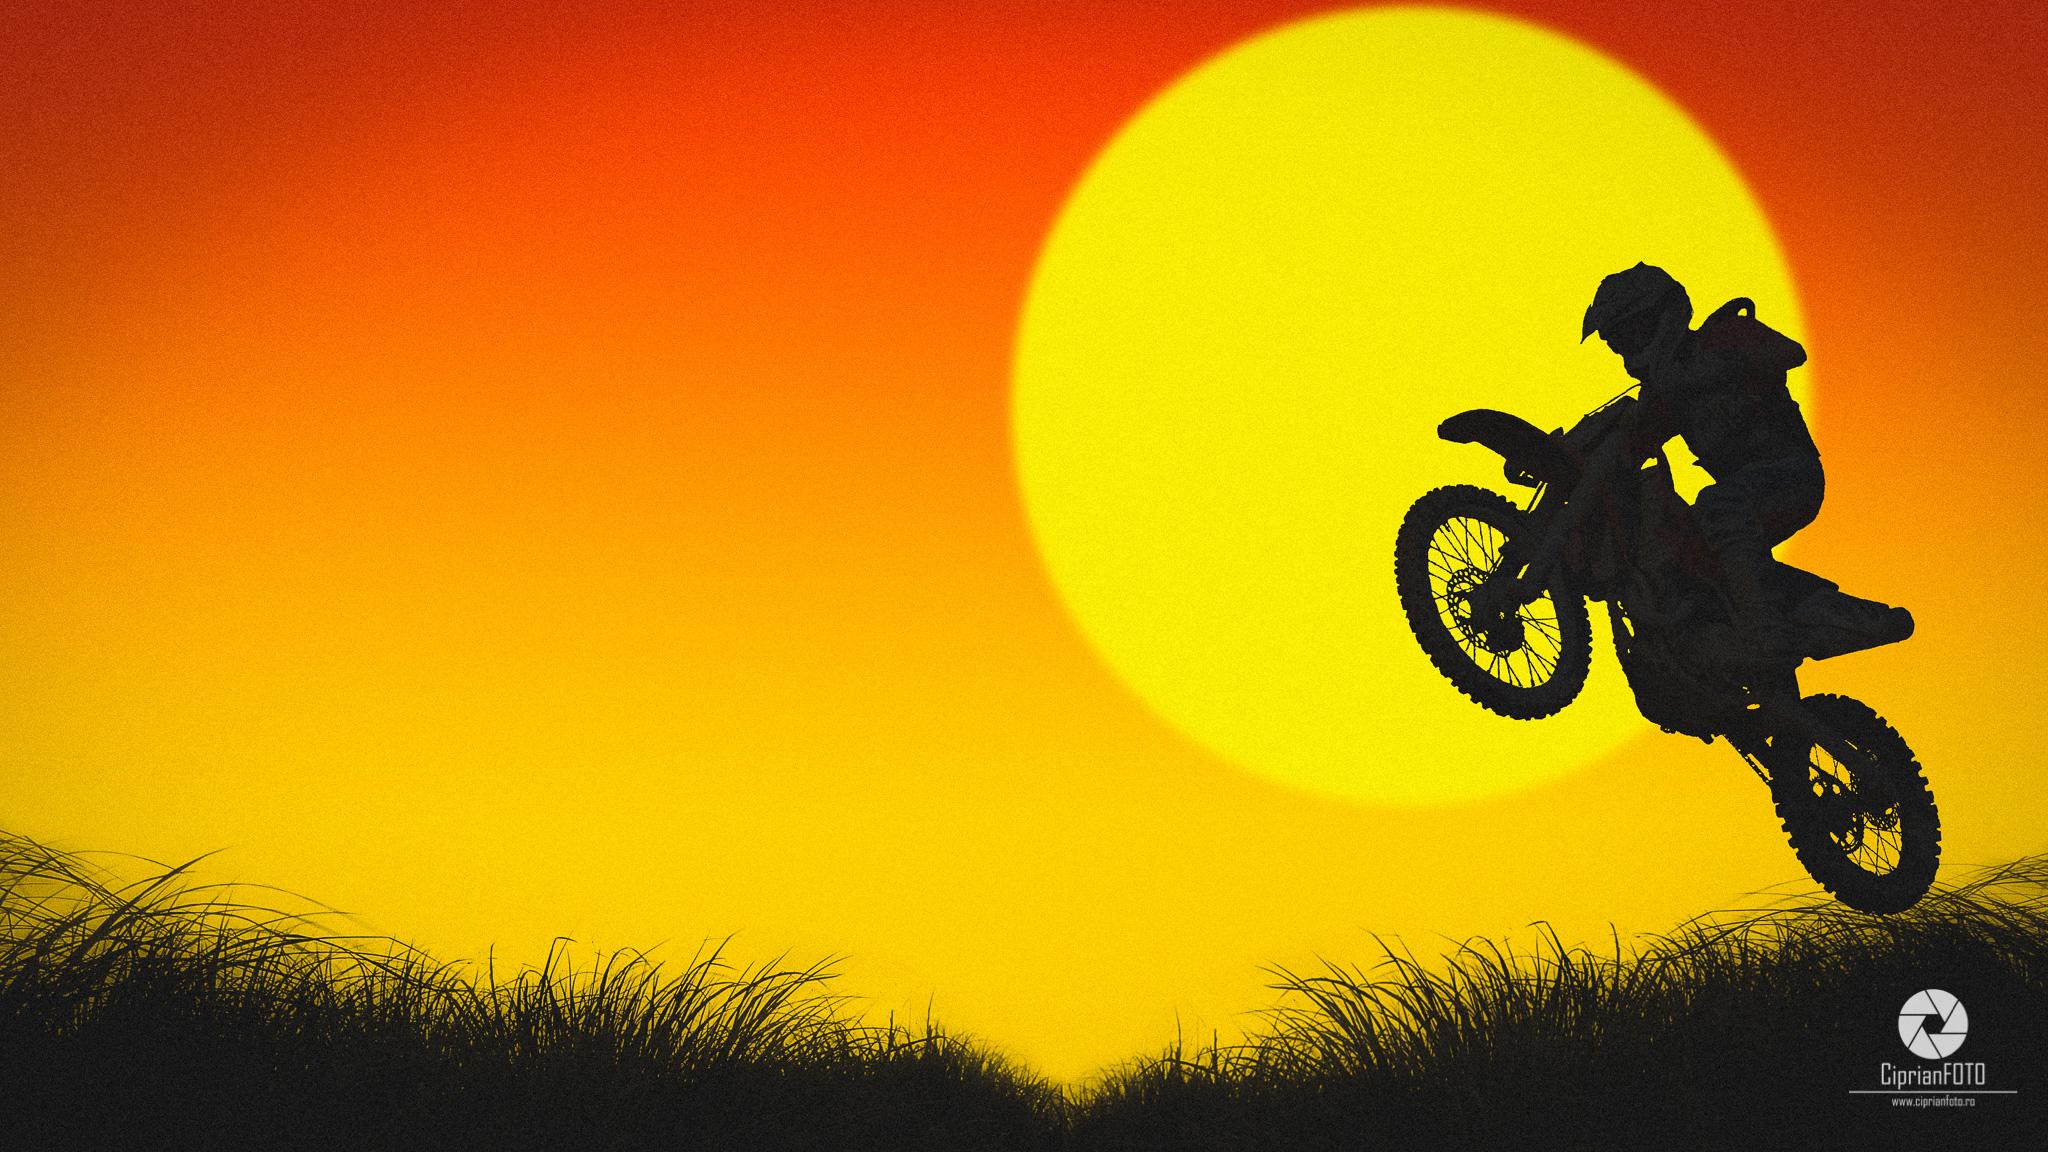 Photoshop CC 2020 Tutorial, Jumping, Motocross, Silhouette Effect, Photoshop, CiprianFOTO, Ciprian FOTO